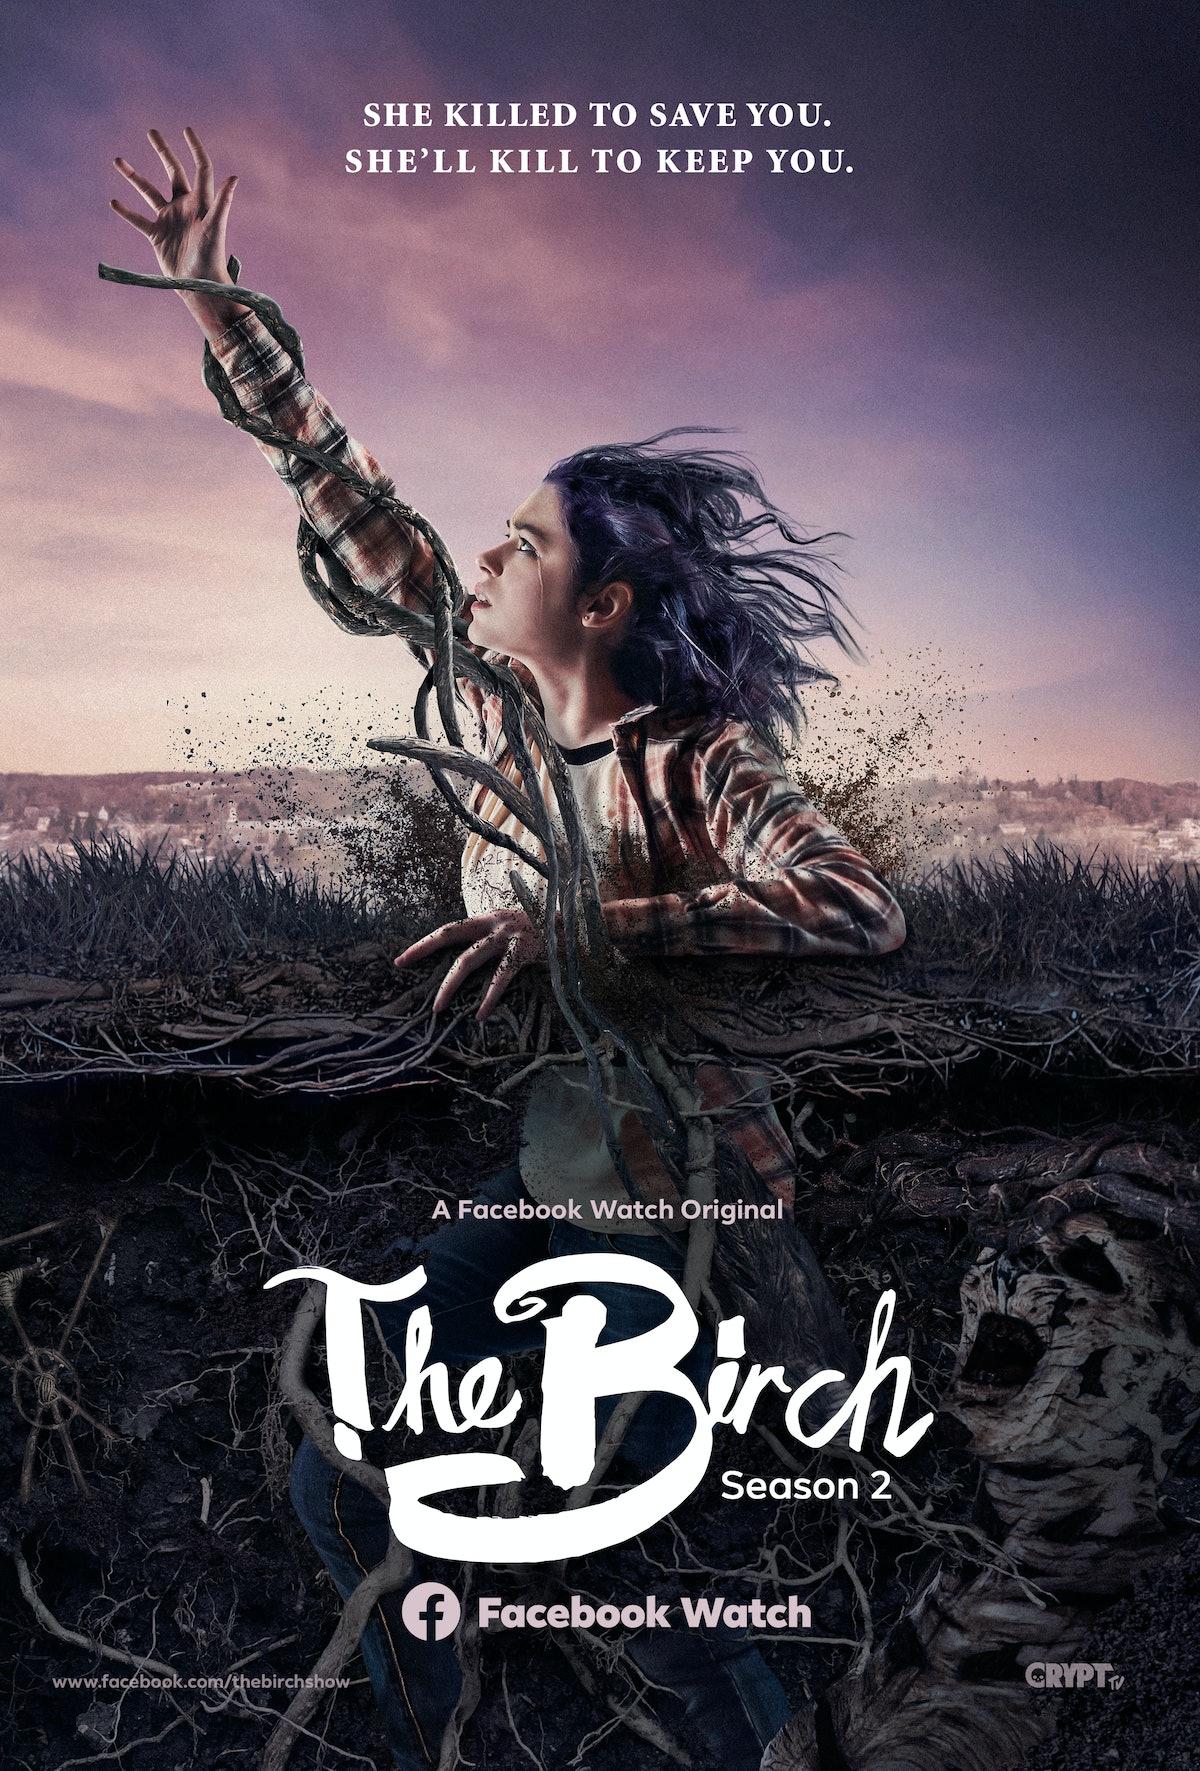 Kay Art from The Birch Season 2